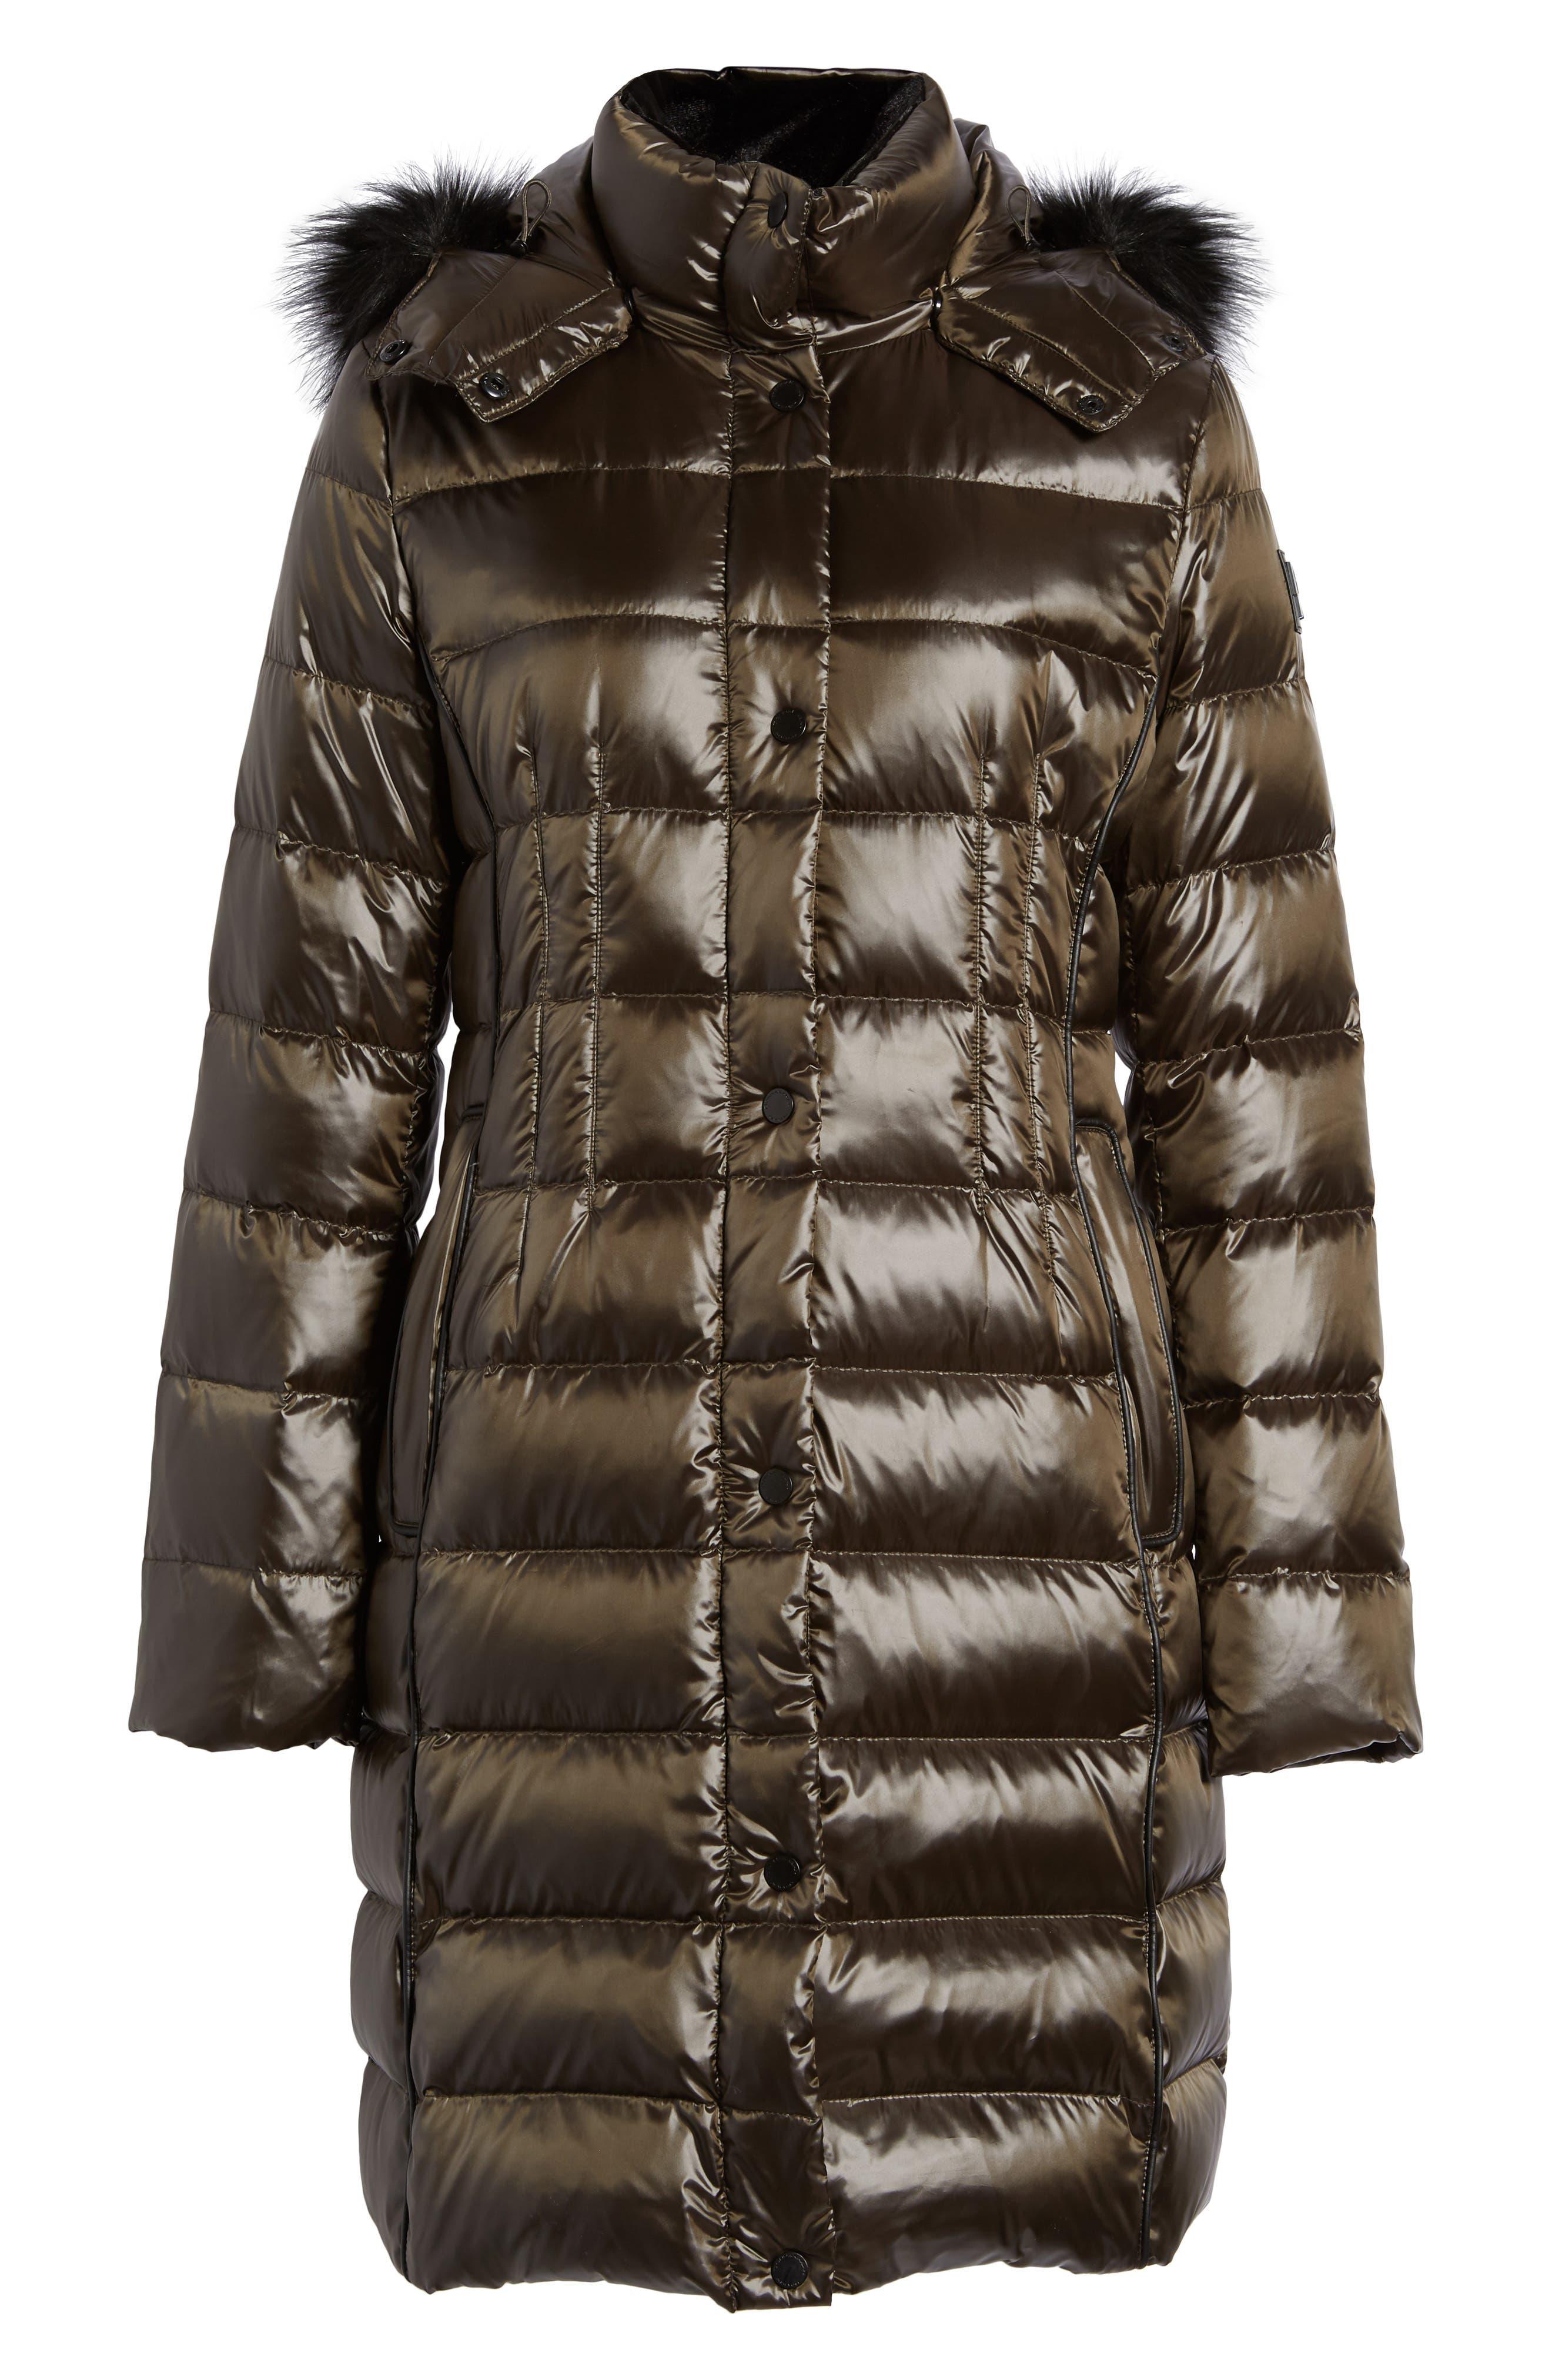 Donna Karan New York Down Puffer Coat with Faux Fur Trim